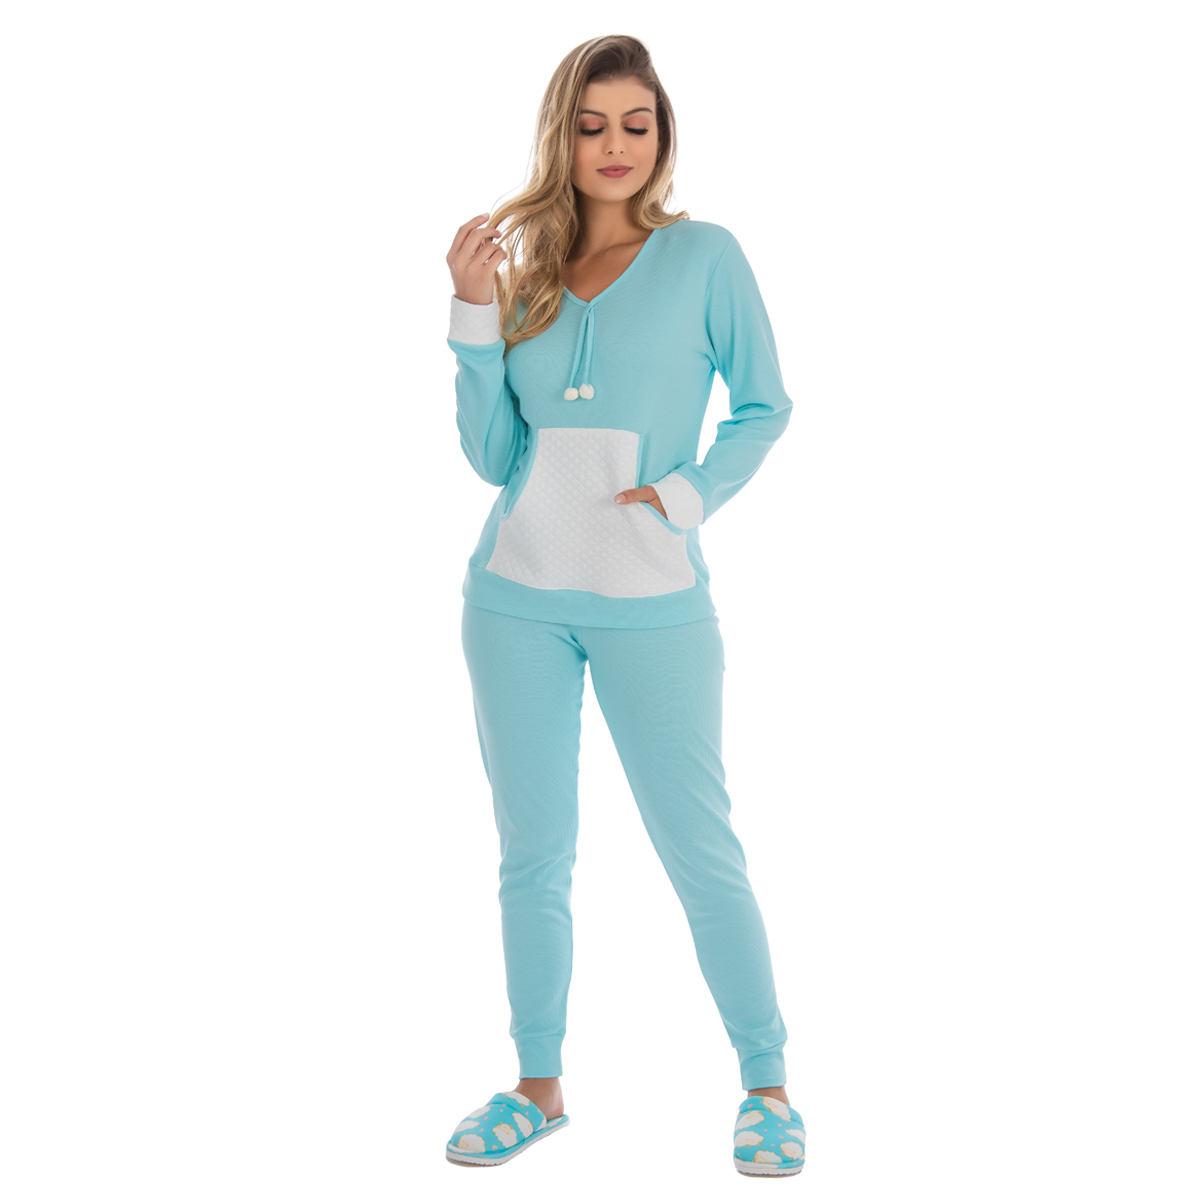 Pijama feminino para o inverno KANGURU POM-POM Victory